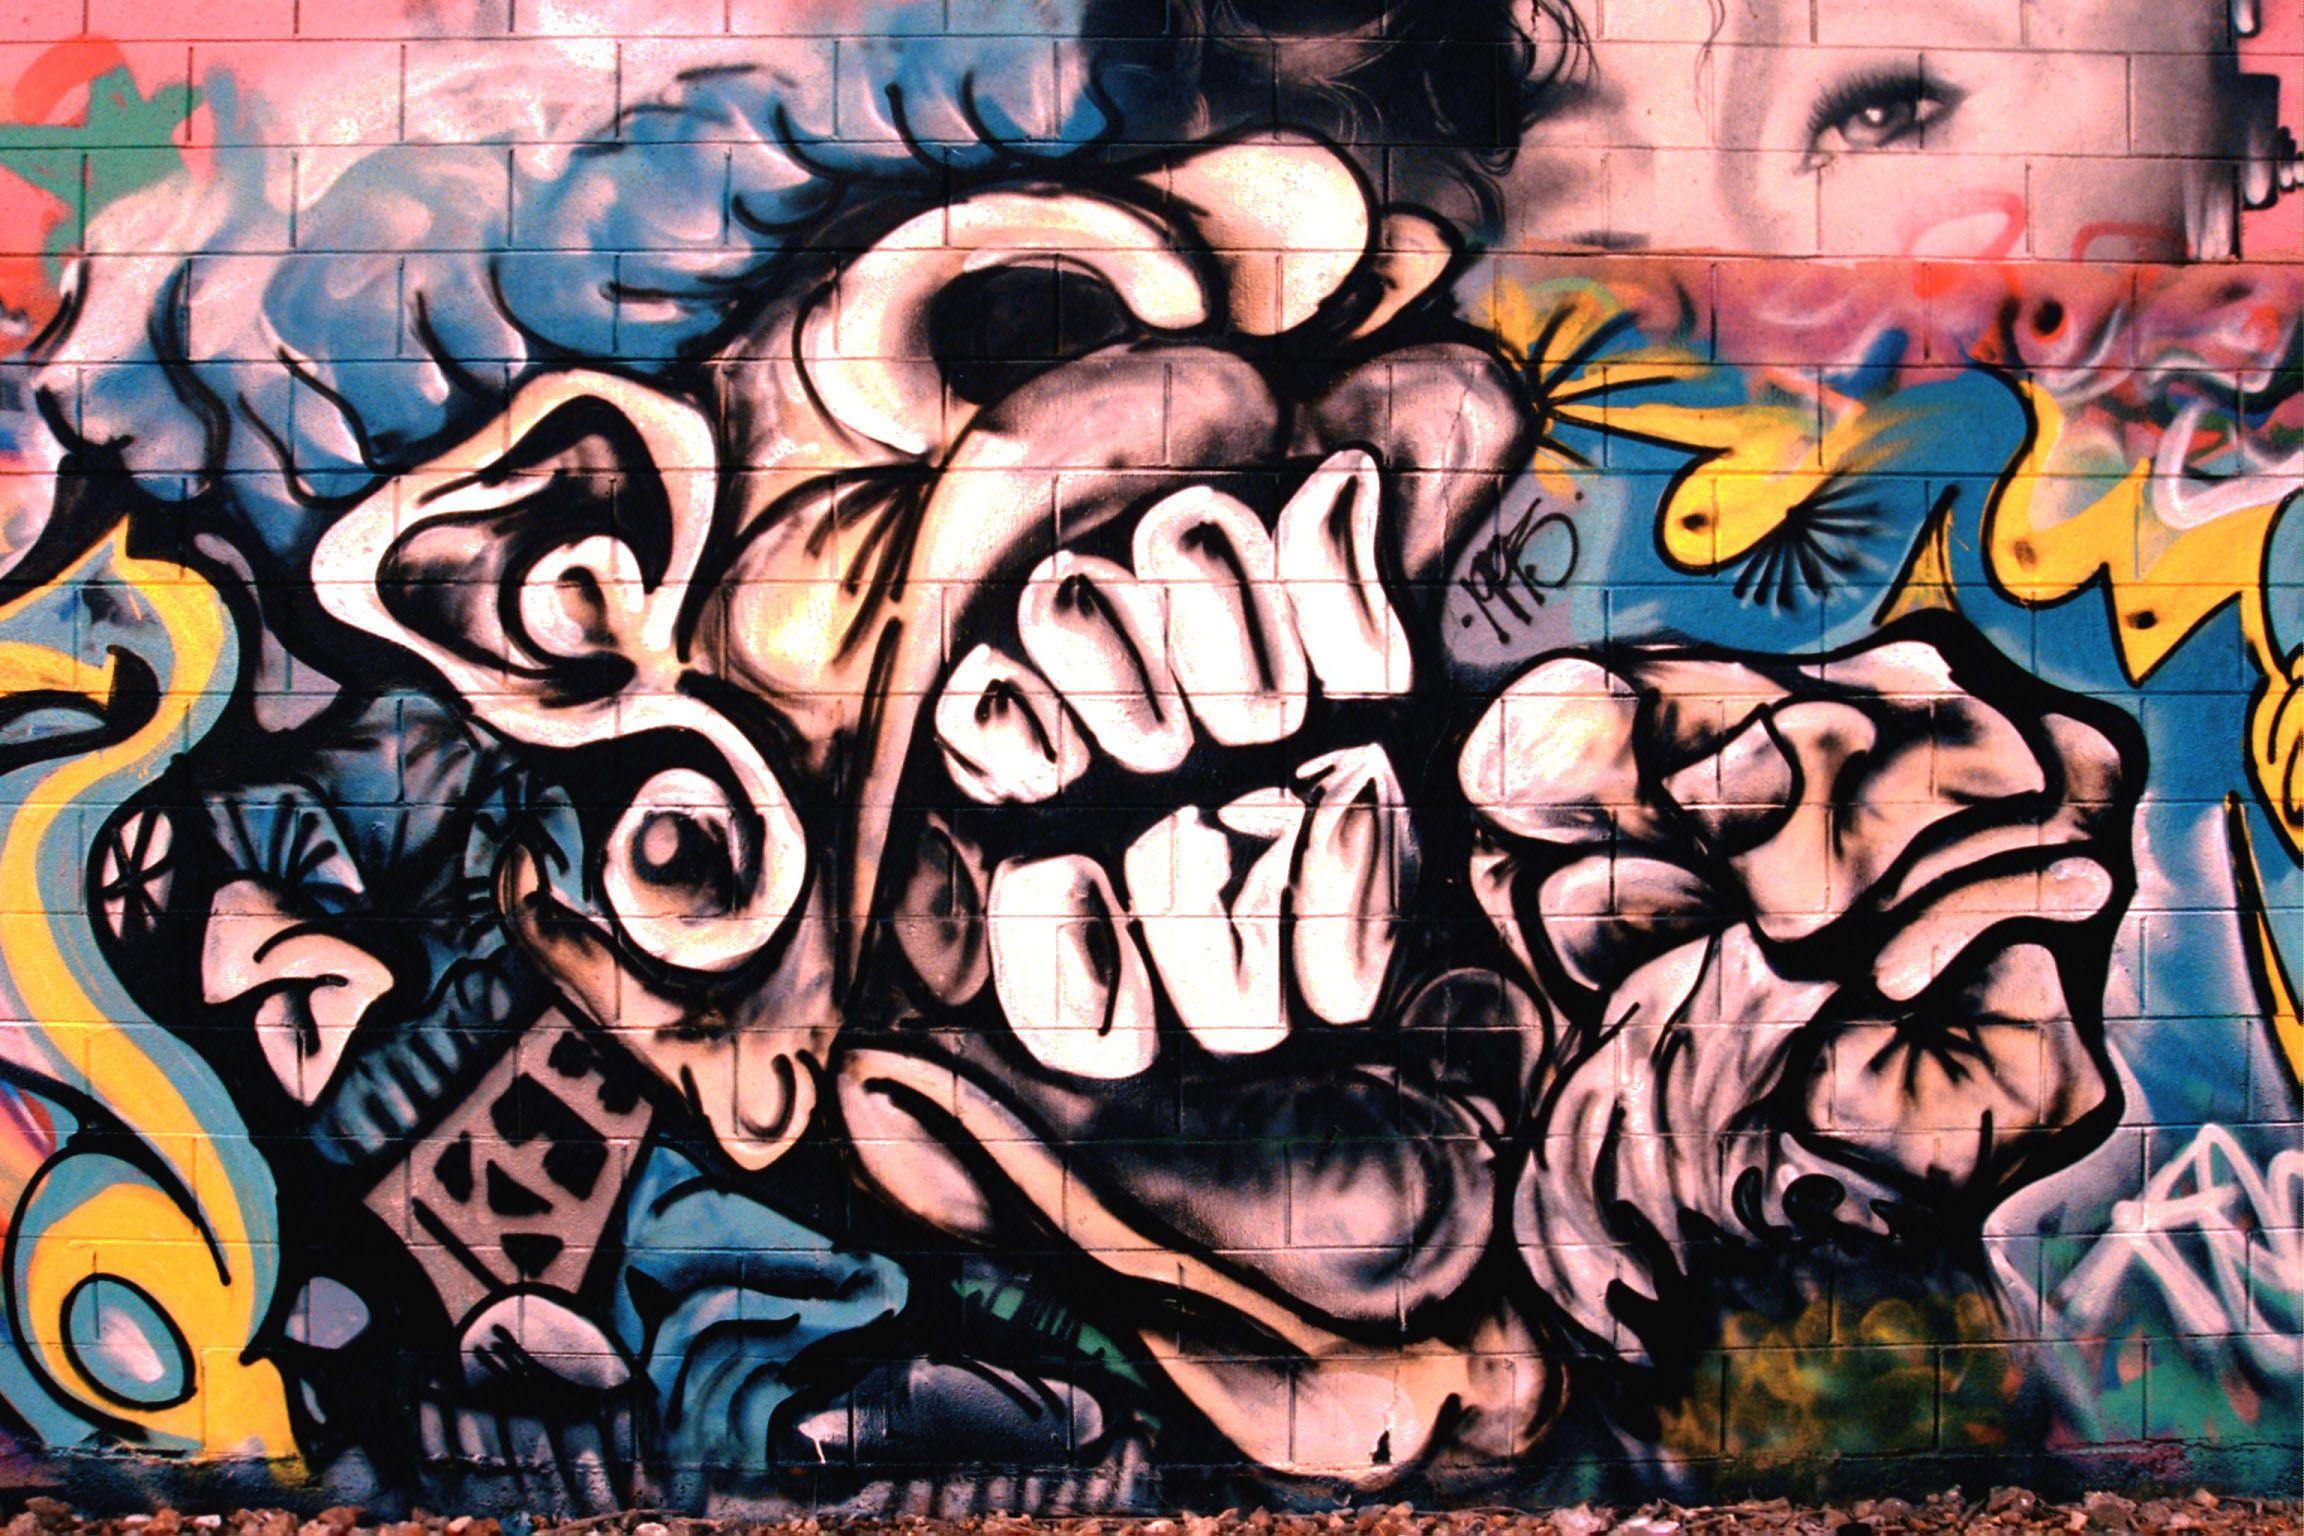 Graffiti Wallpaper Download Jpg 2304 1536 Graffiti Wallpaper Graffiti Best Graffiti